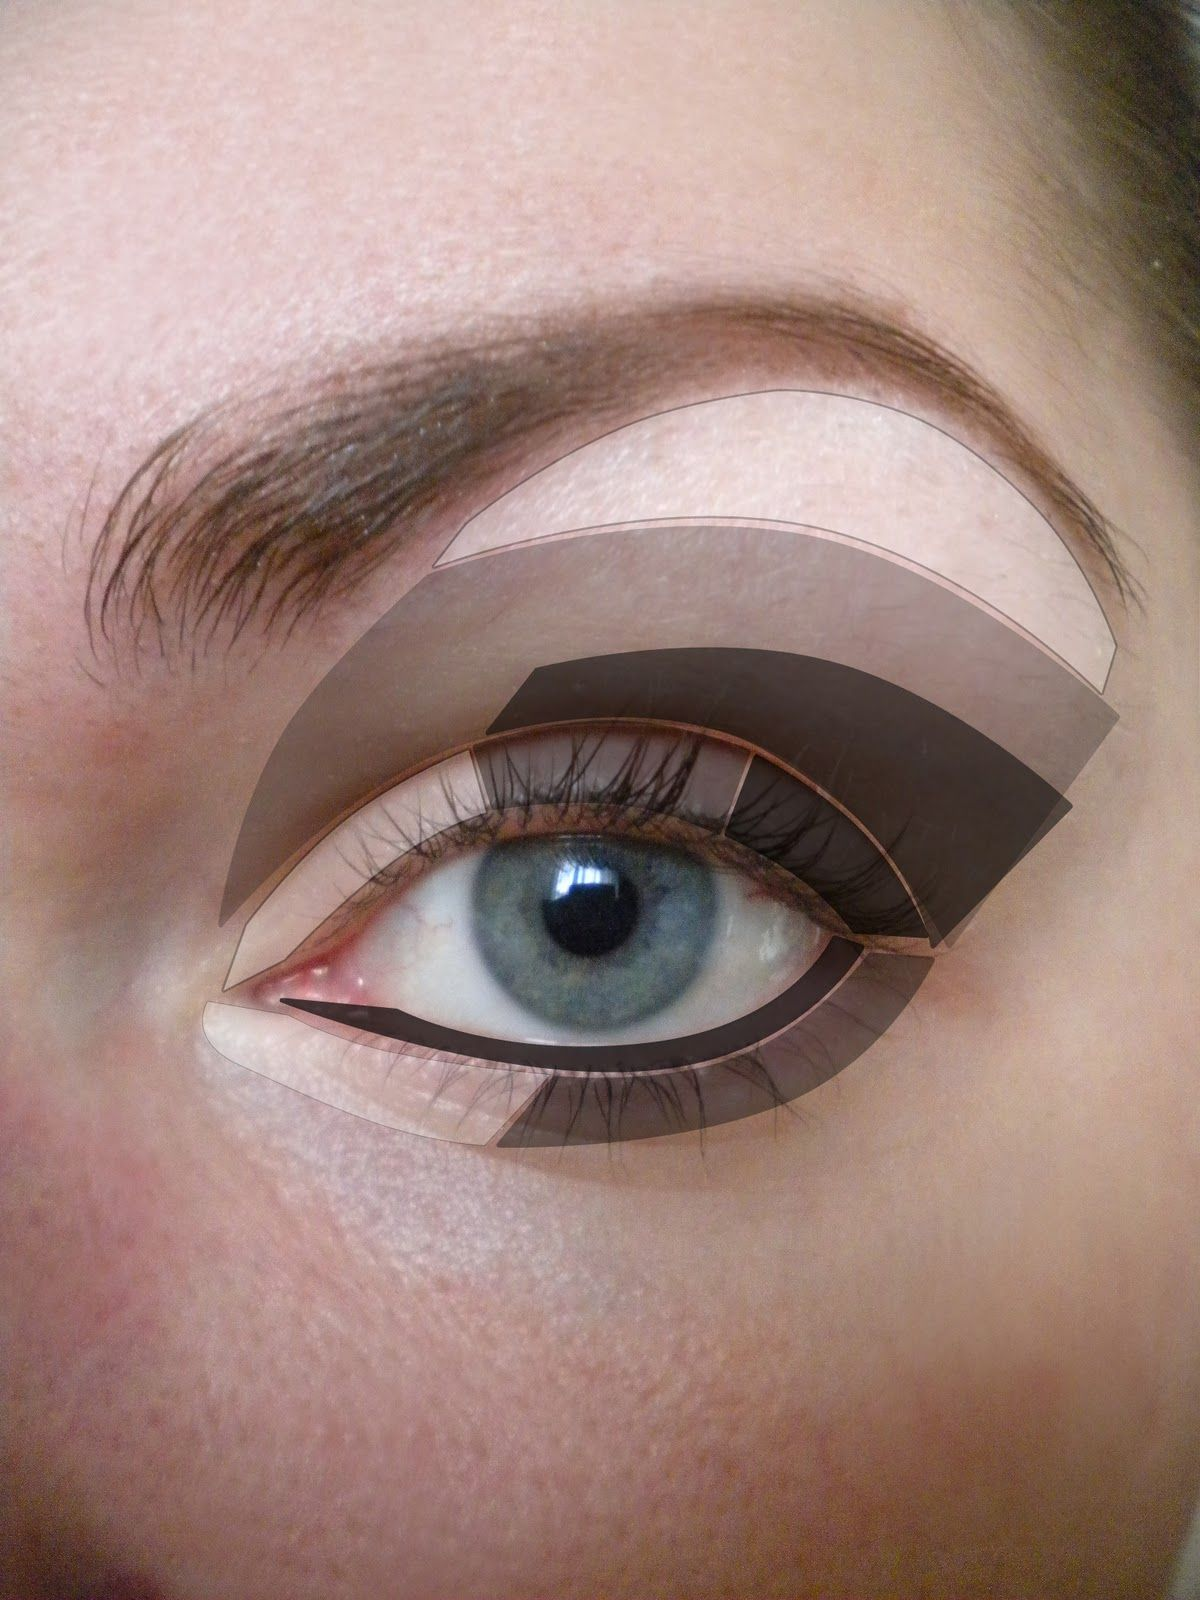 Smokey Eye How To Guide For Beginners Eyeshadow Hacks Tips Tricks